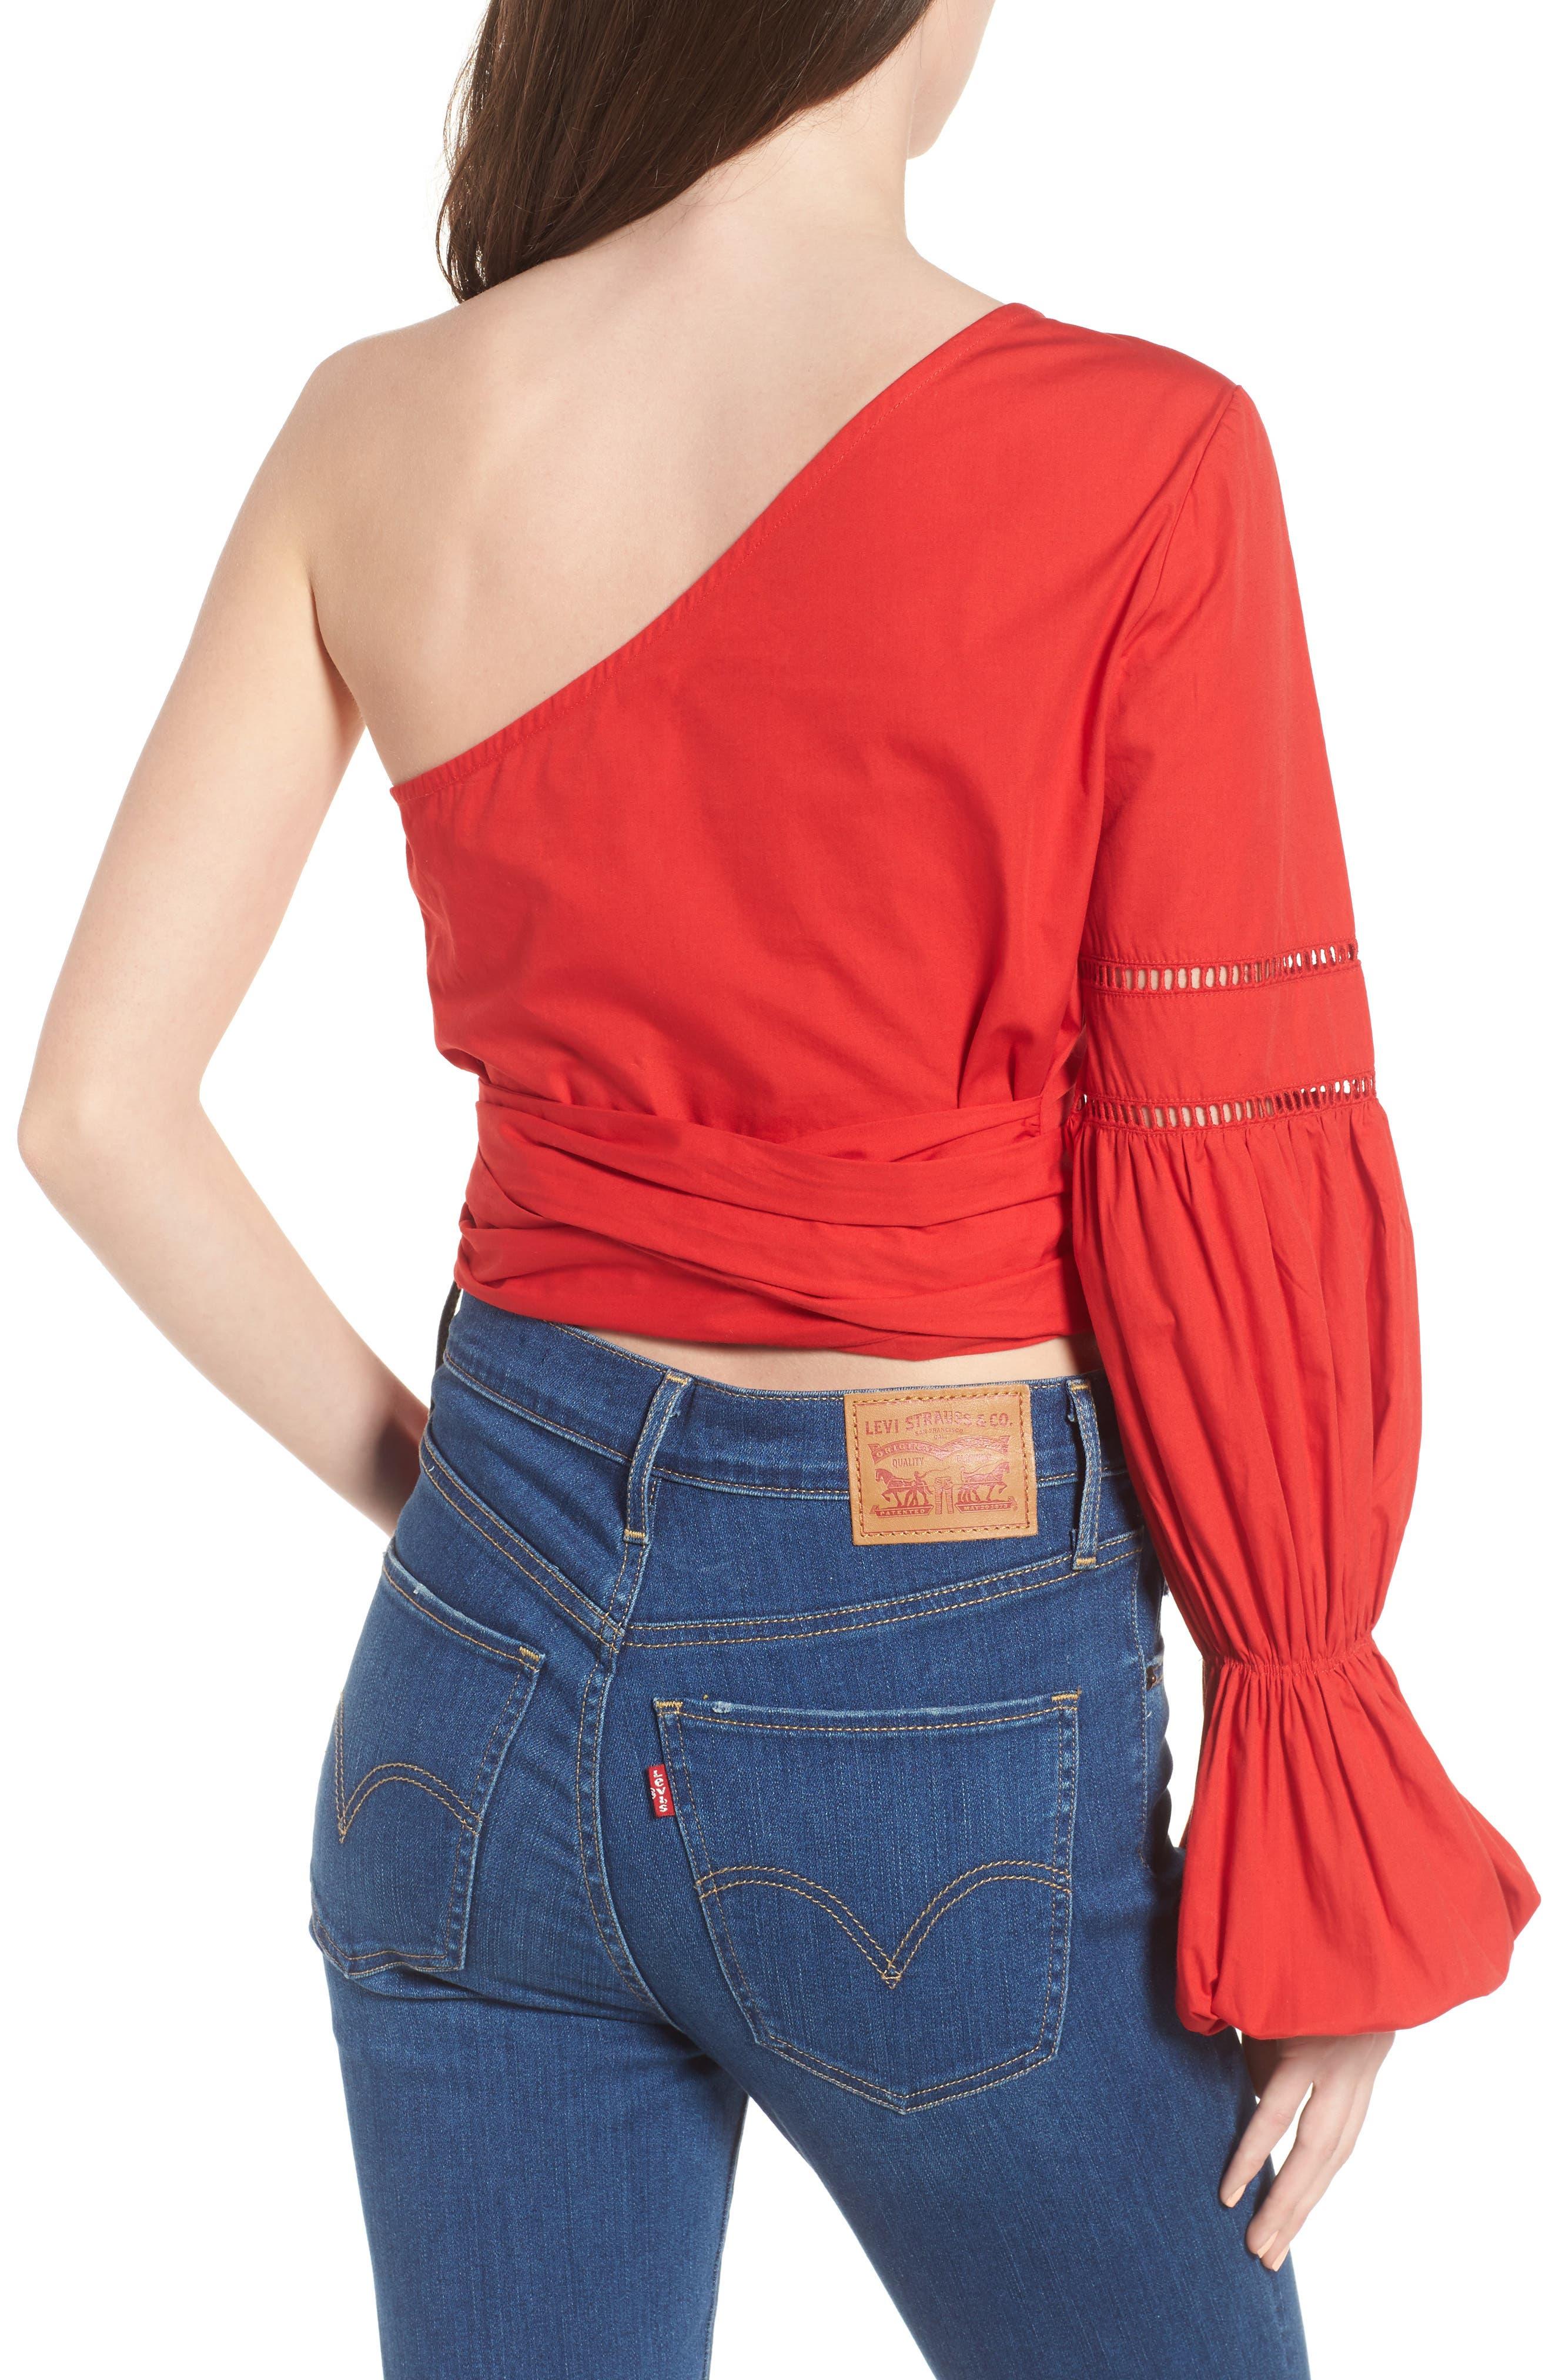 TULAROSA,                             Lola One-Shoulder Blouse,                             Alternate thumbnail 2, color,                             601